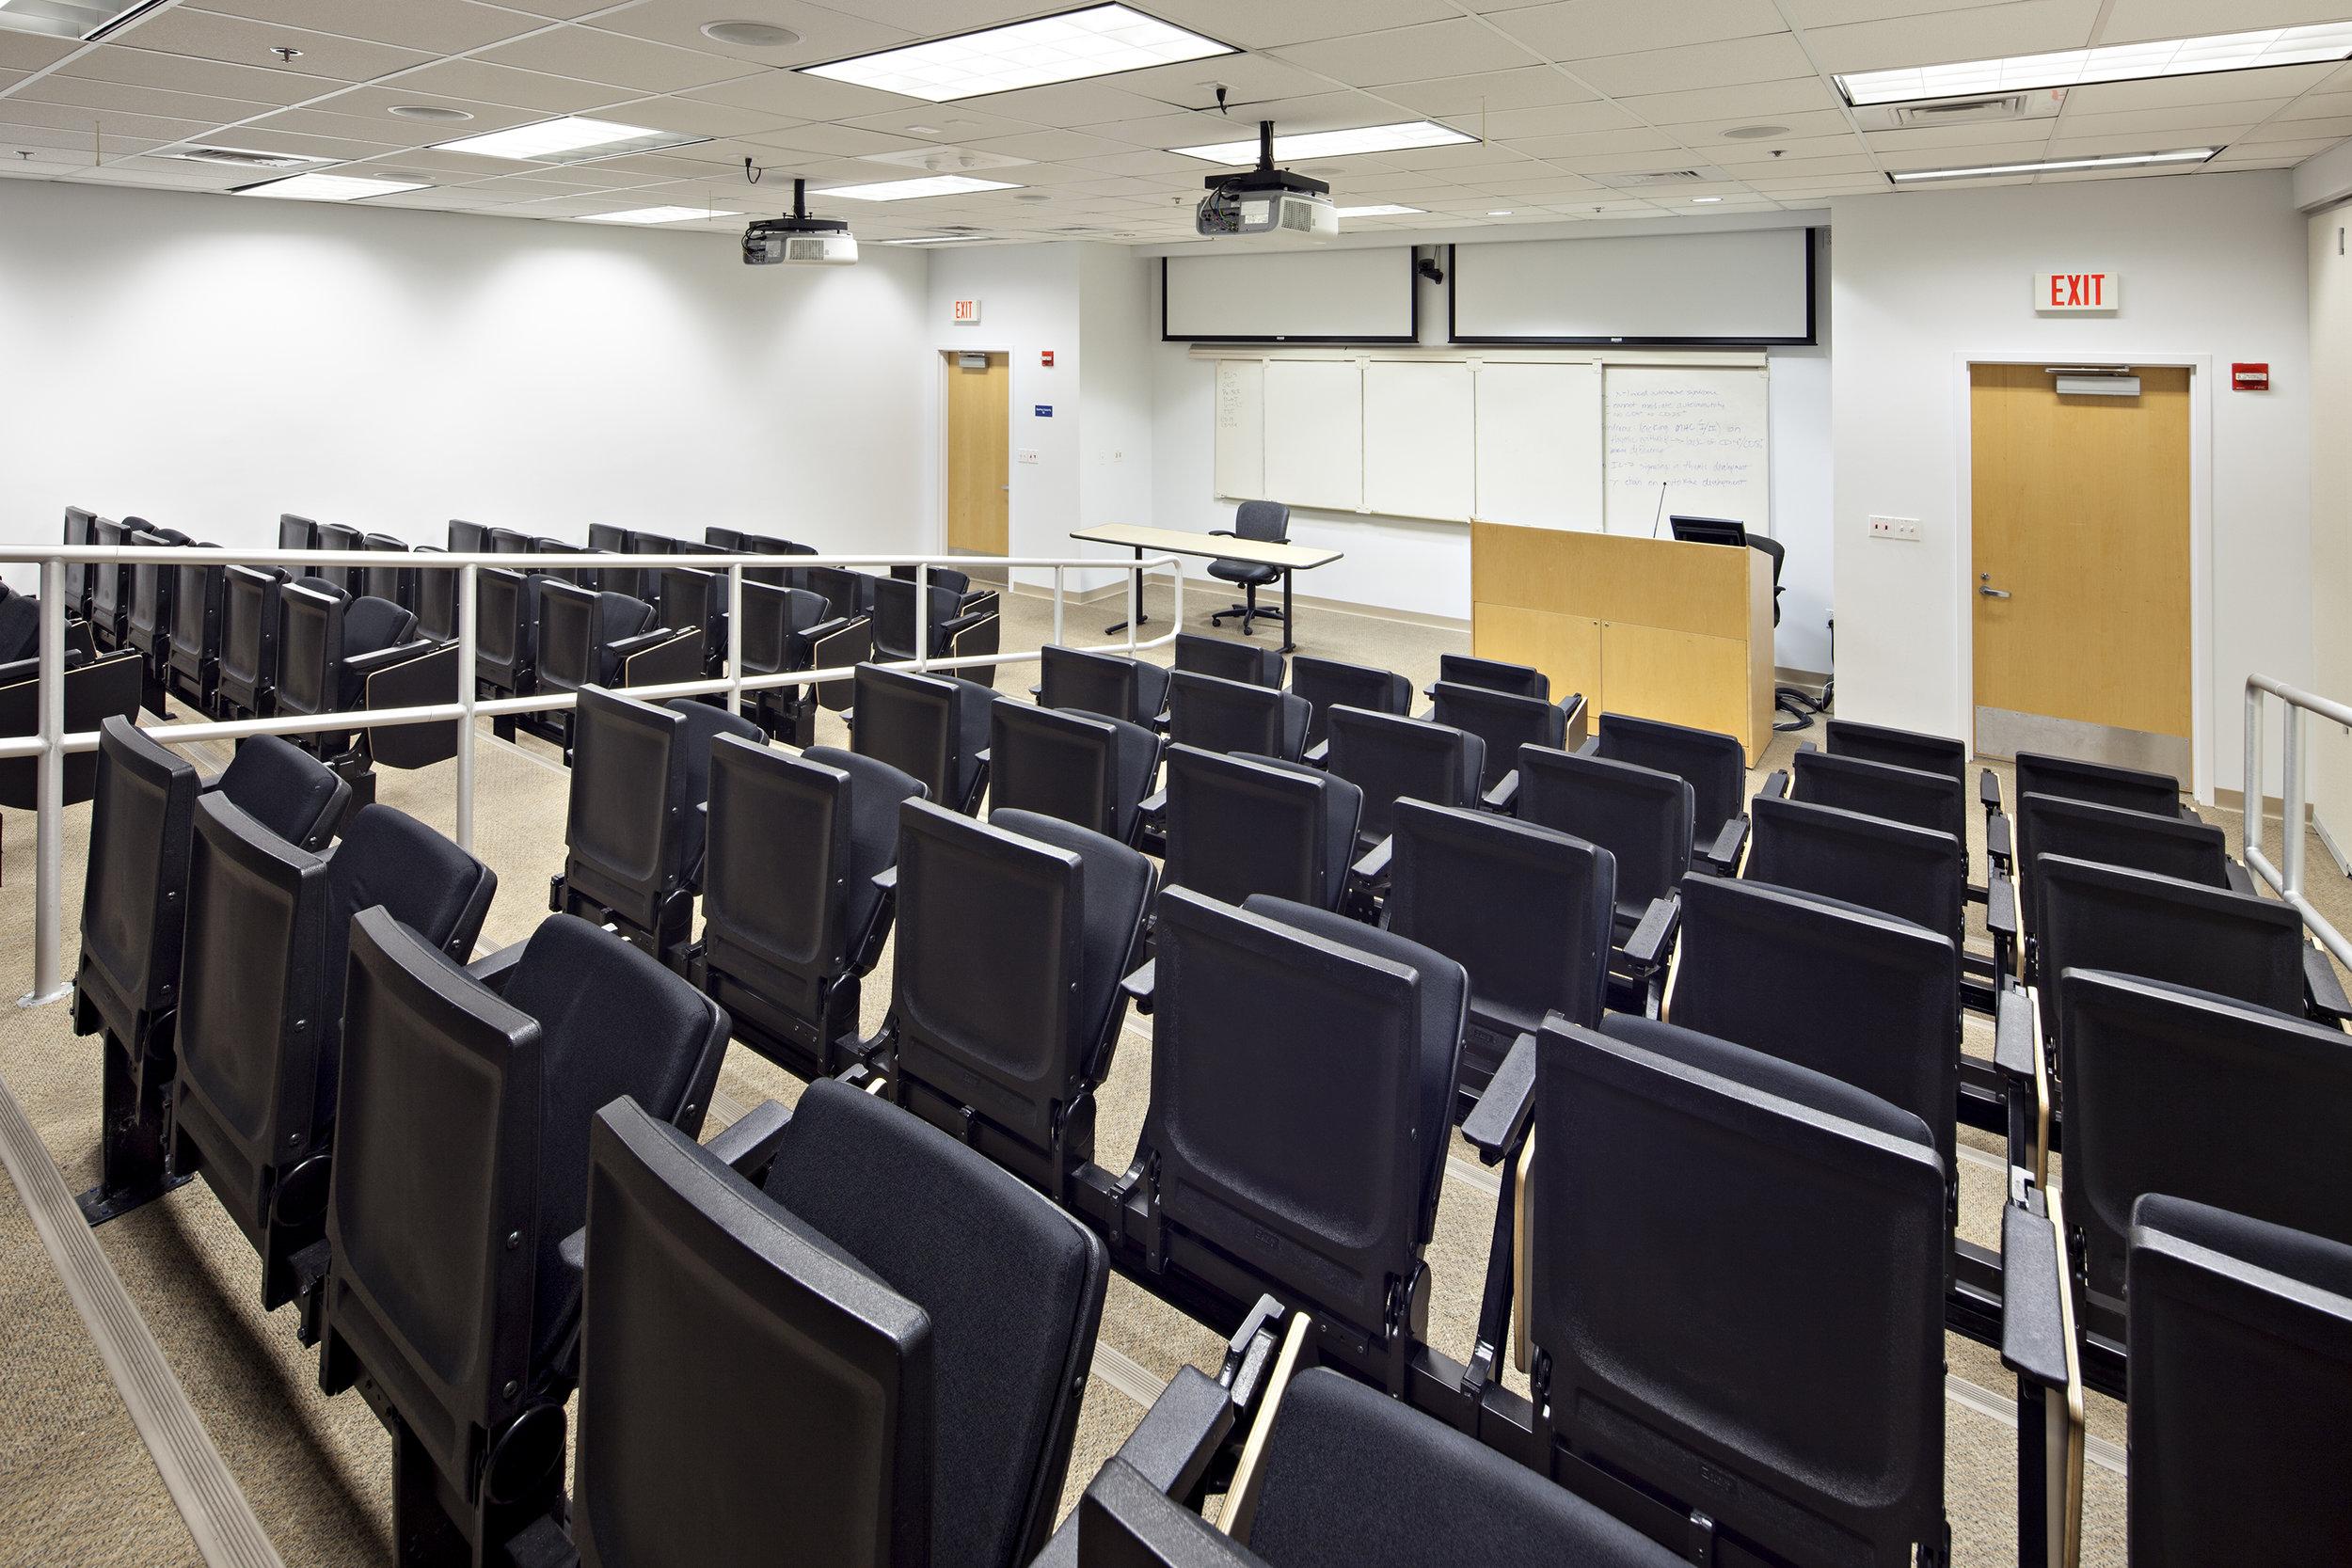 stadium seating classroom 2.jpg